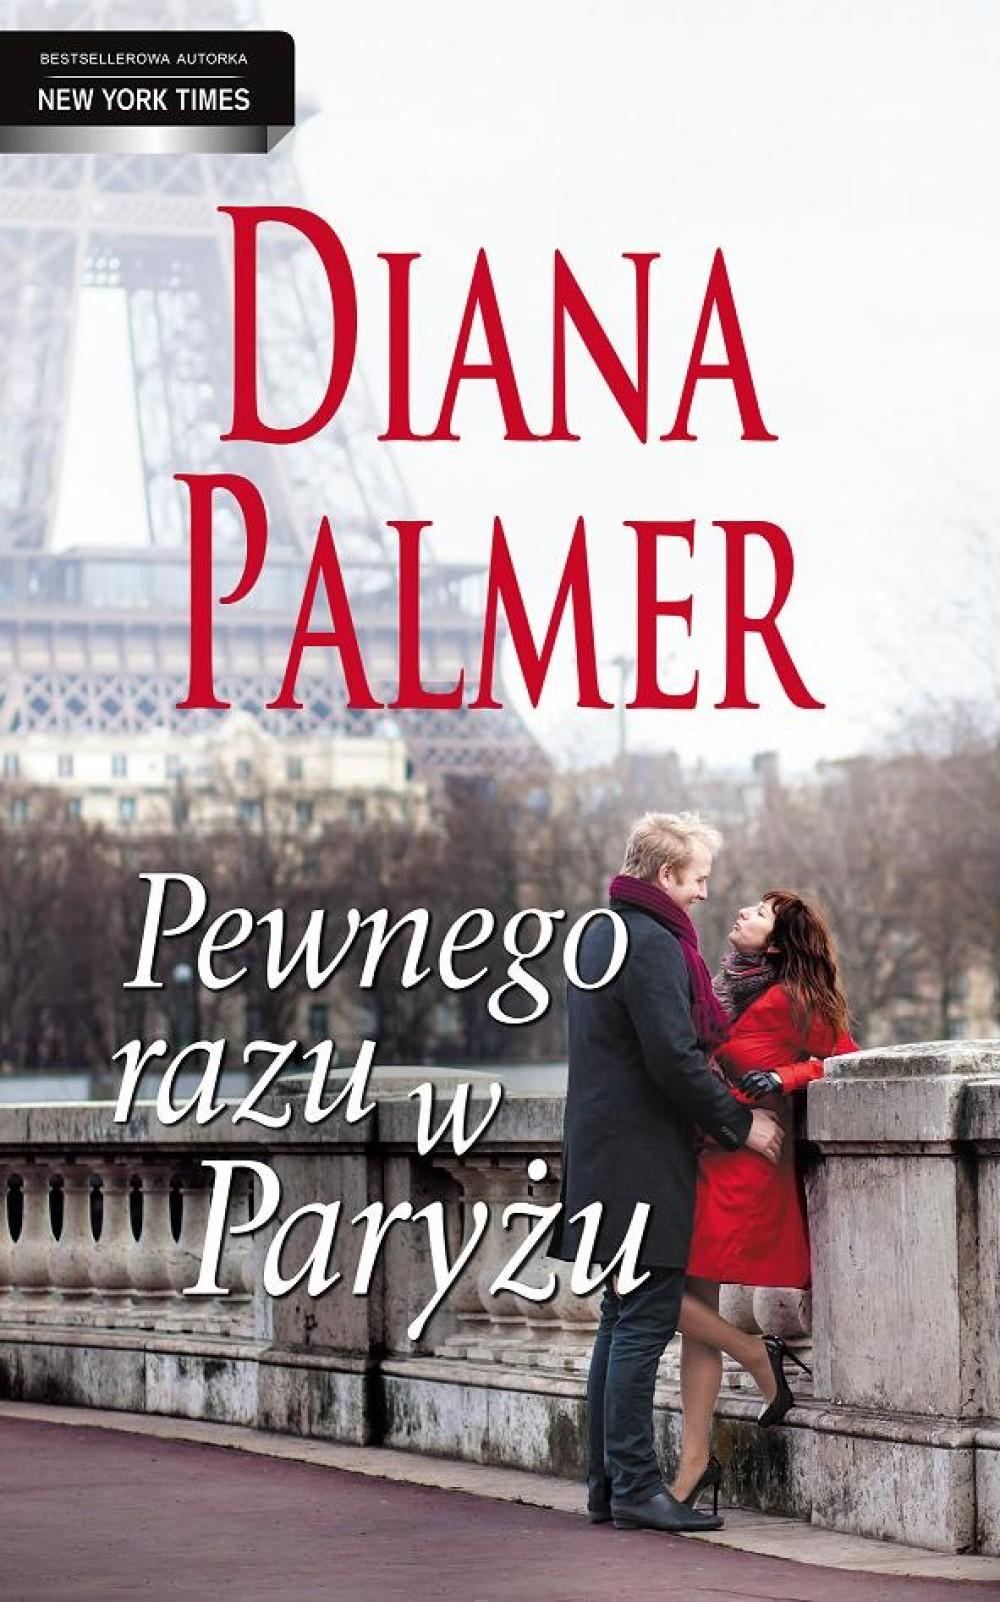 :: Pewnego razu w Paryżu - e-book ::